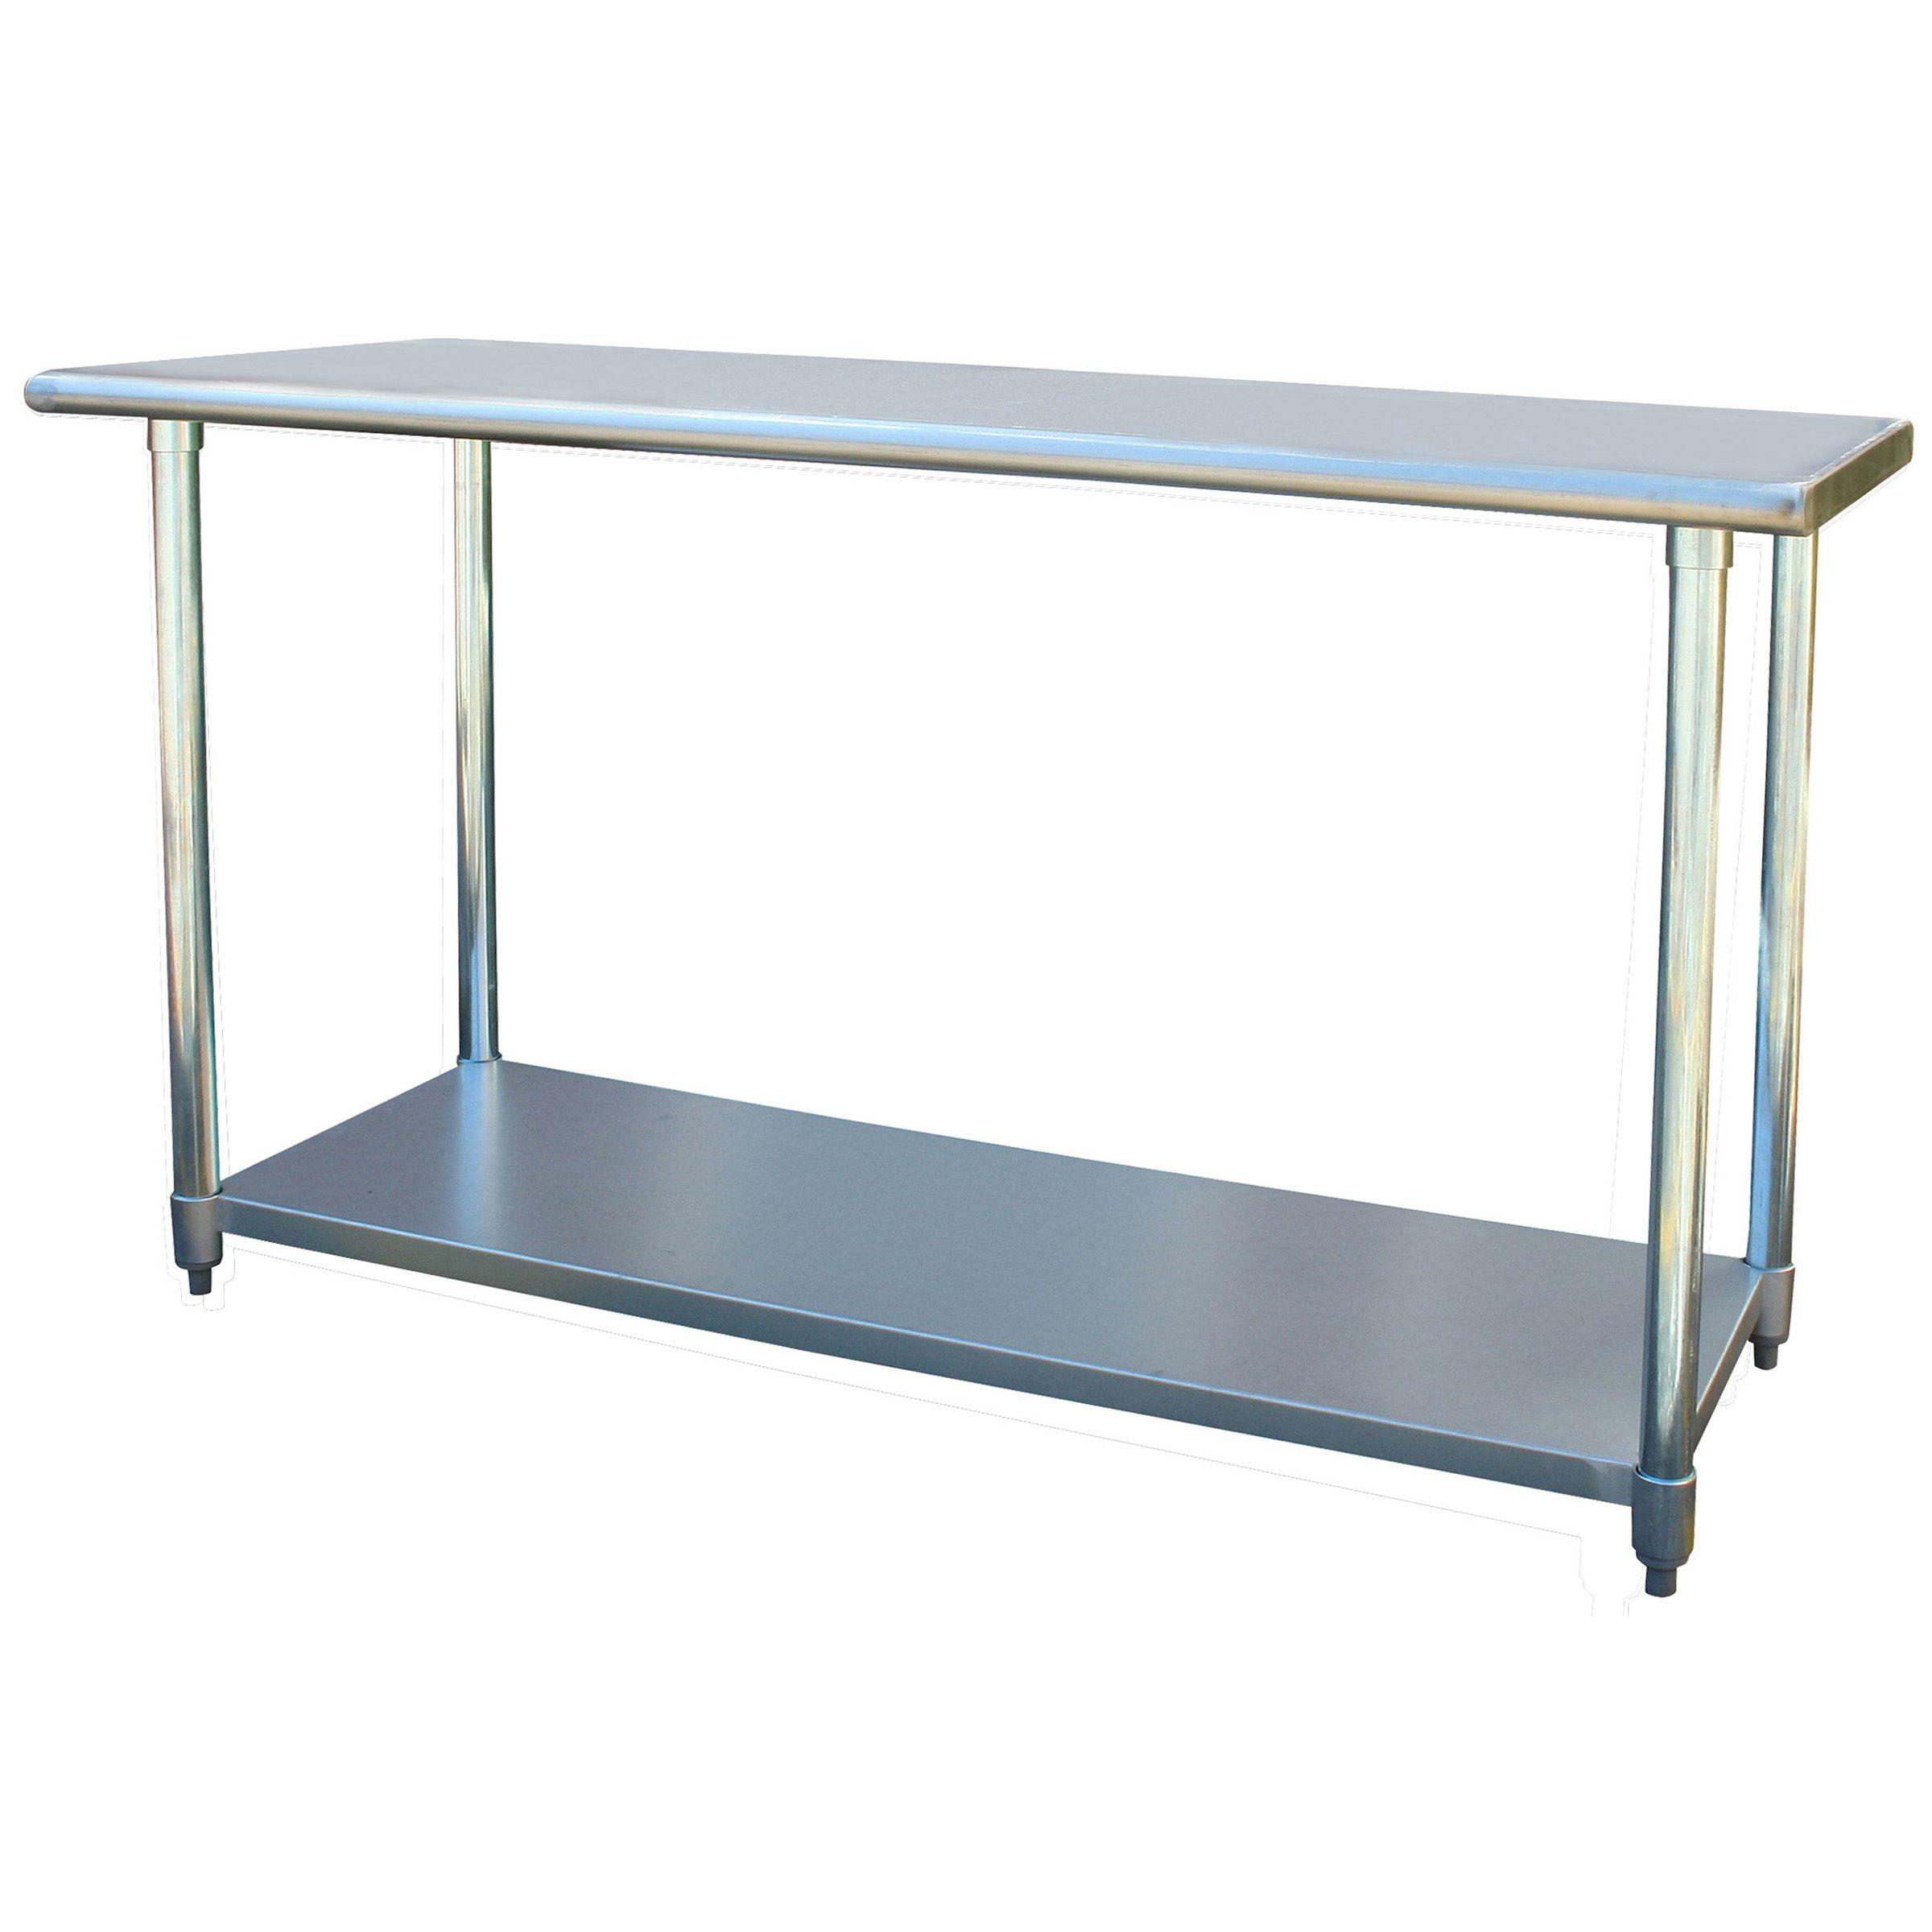 Sportsman Series Stainless Steel Work Table 24 X 60 Pleasing 60 Inch Kitchen Island Design Decoration